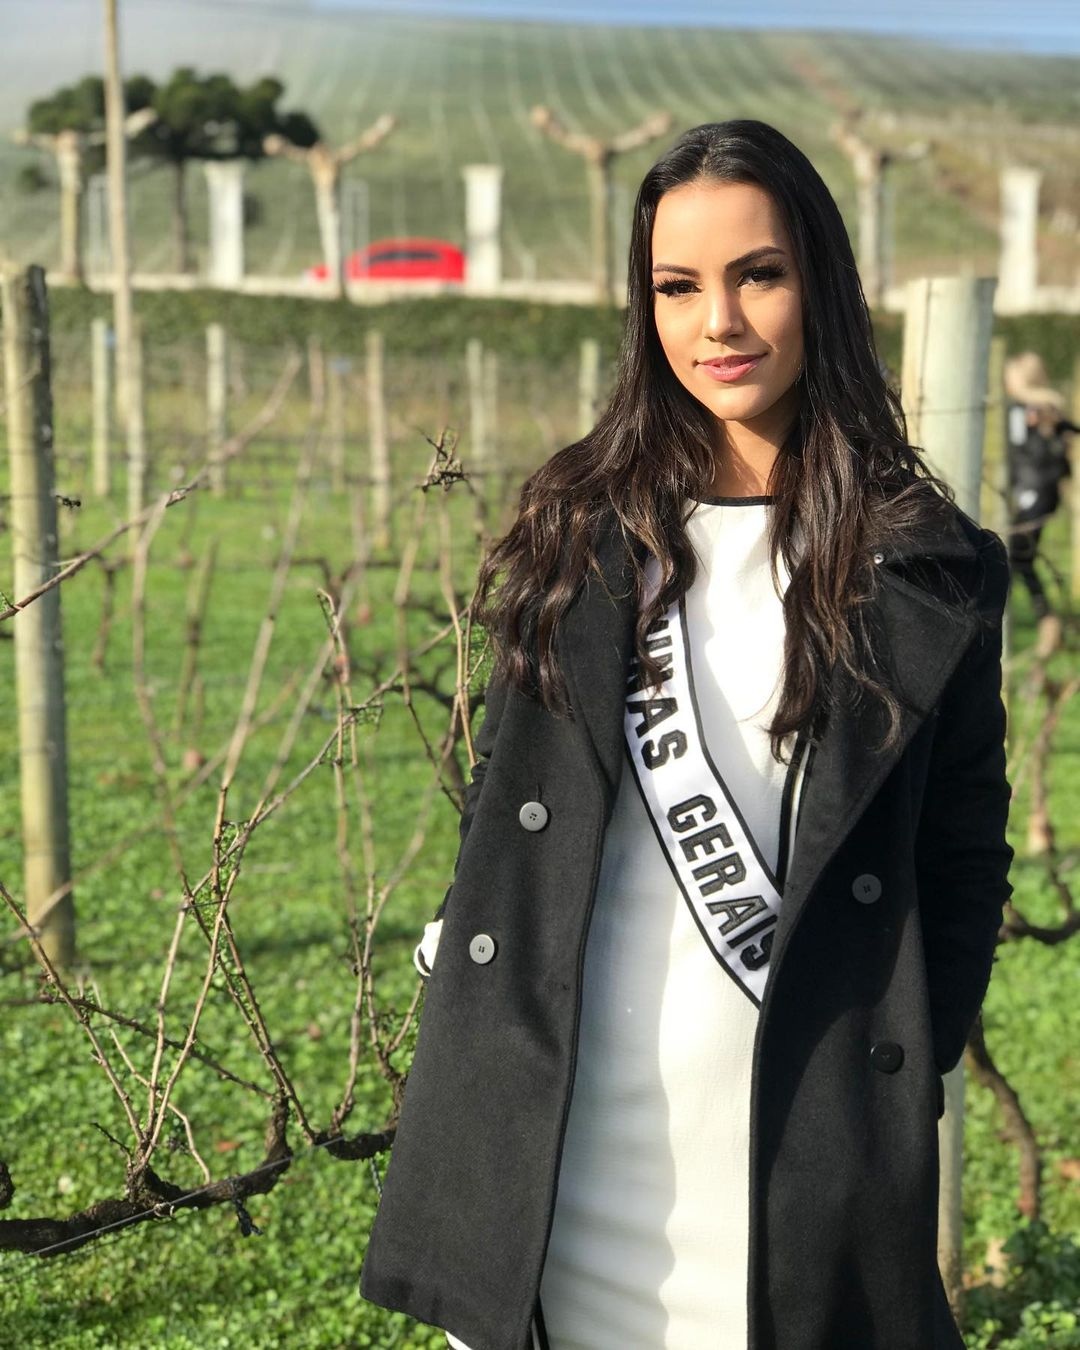 rafaella felipe, top 20 de miss brasil mundo 2019. - Página 9 84151410